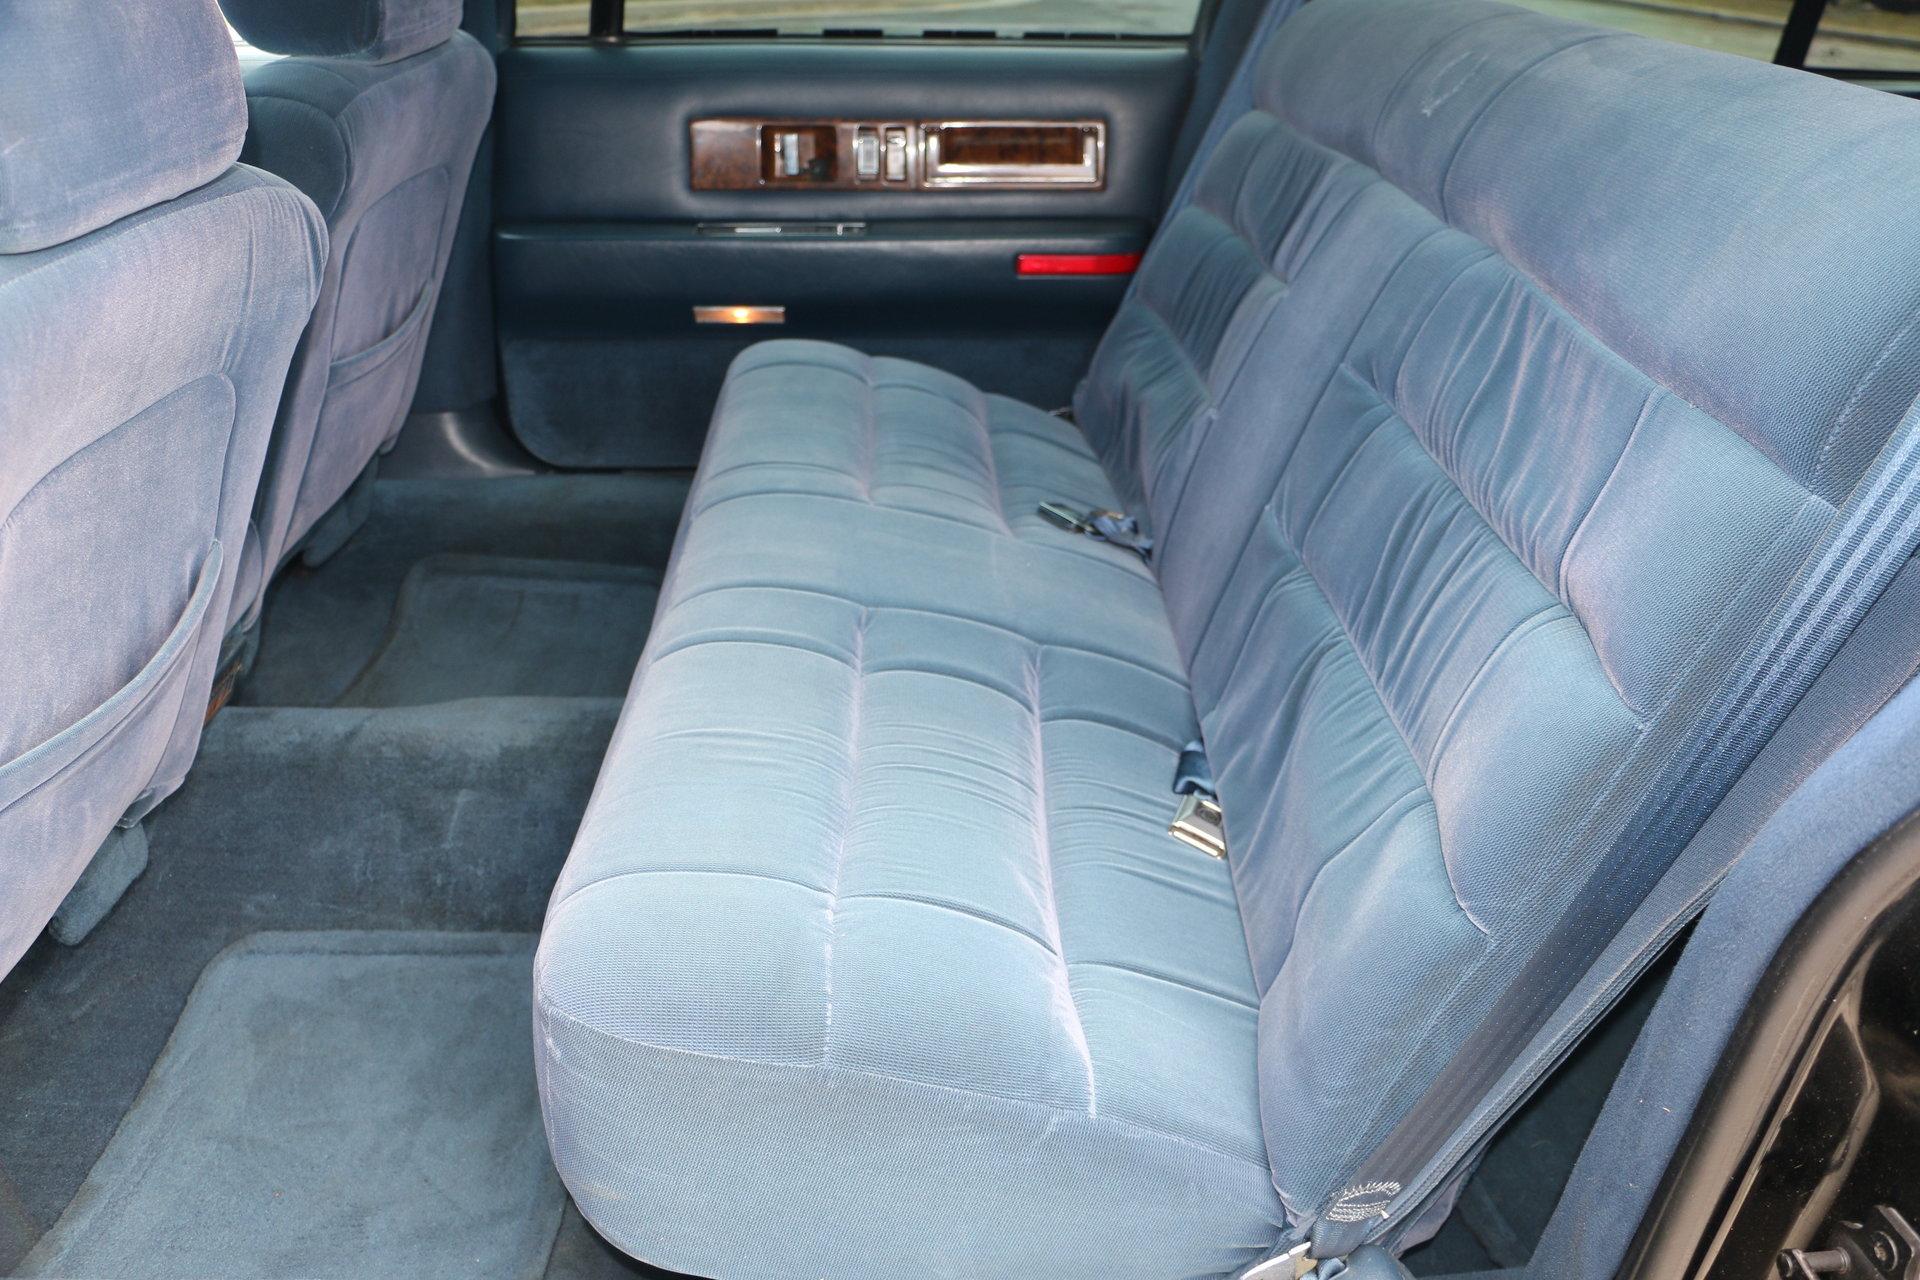 1993 Cadillac Fleetwood Limousine | Hip Rides